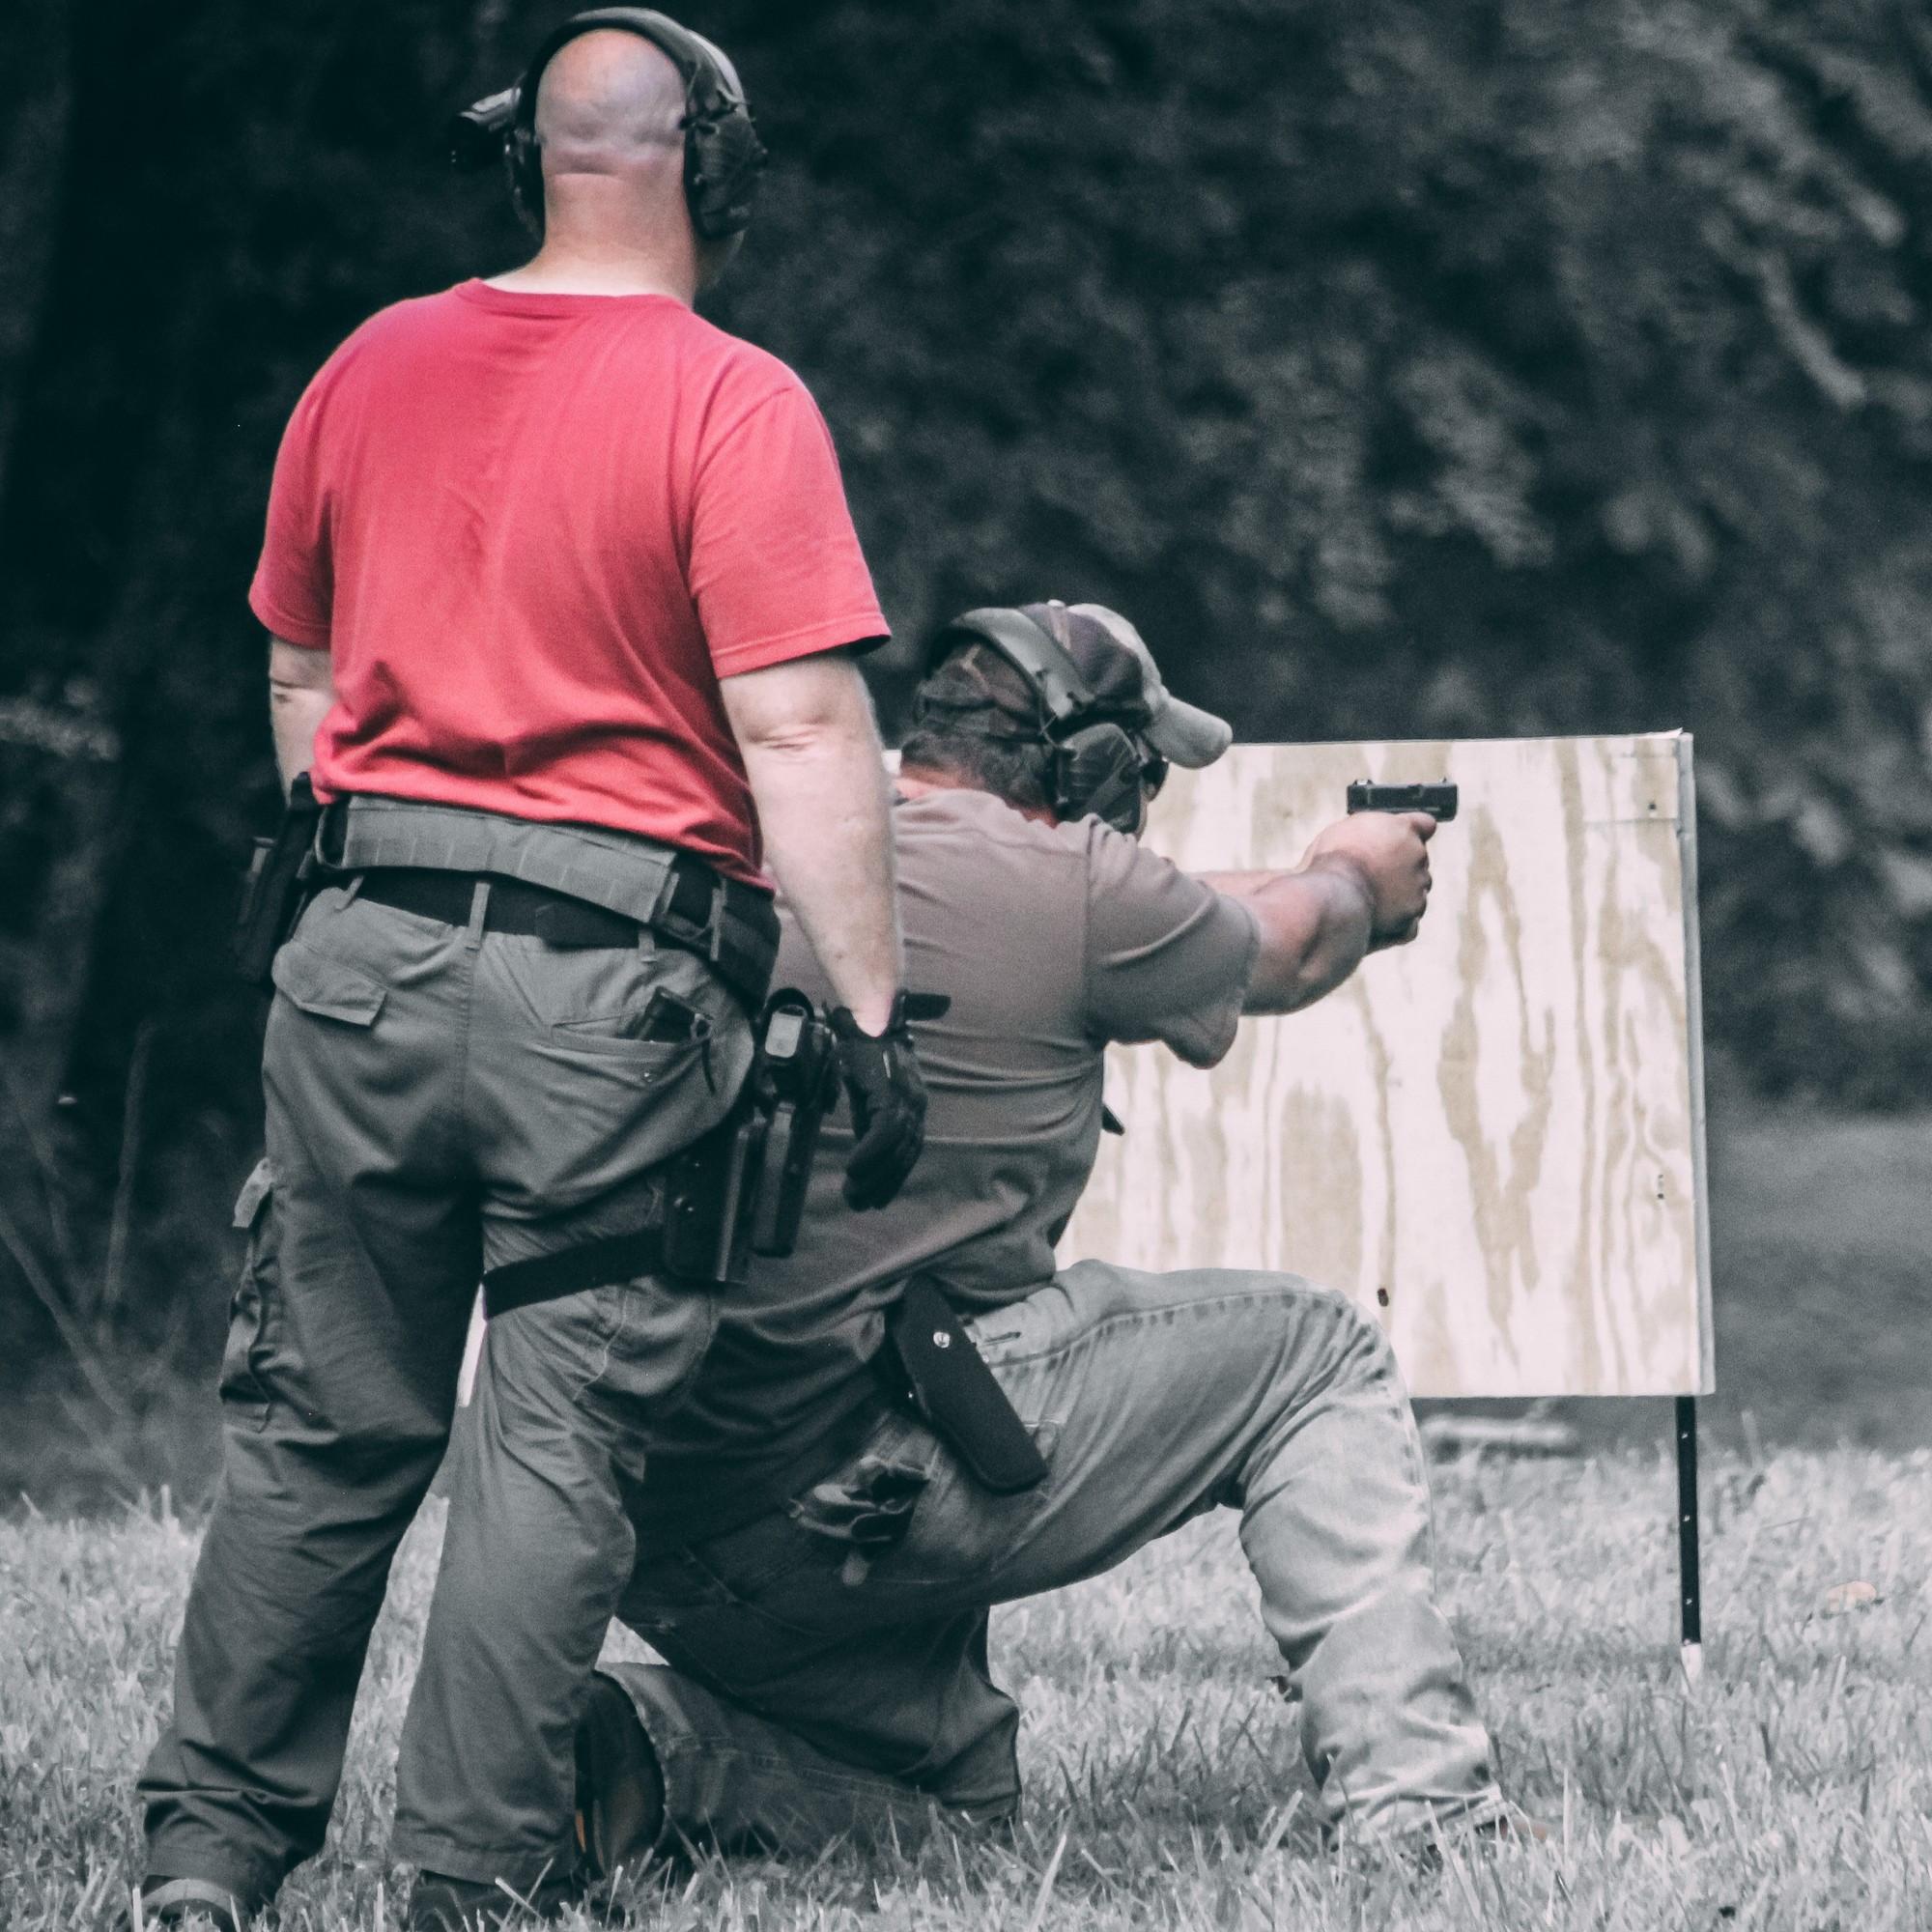 Basic Pistol I/ WV CCW/CHL Classes